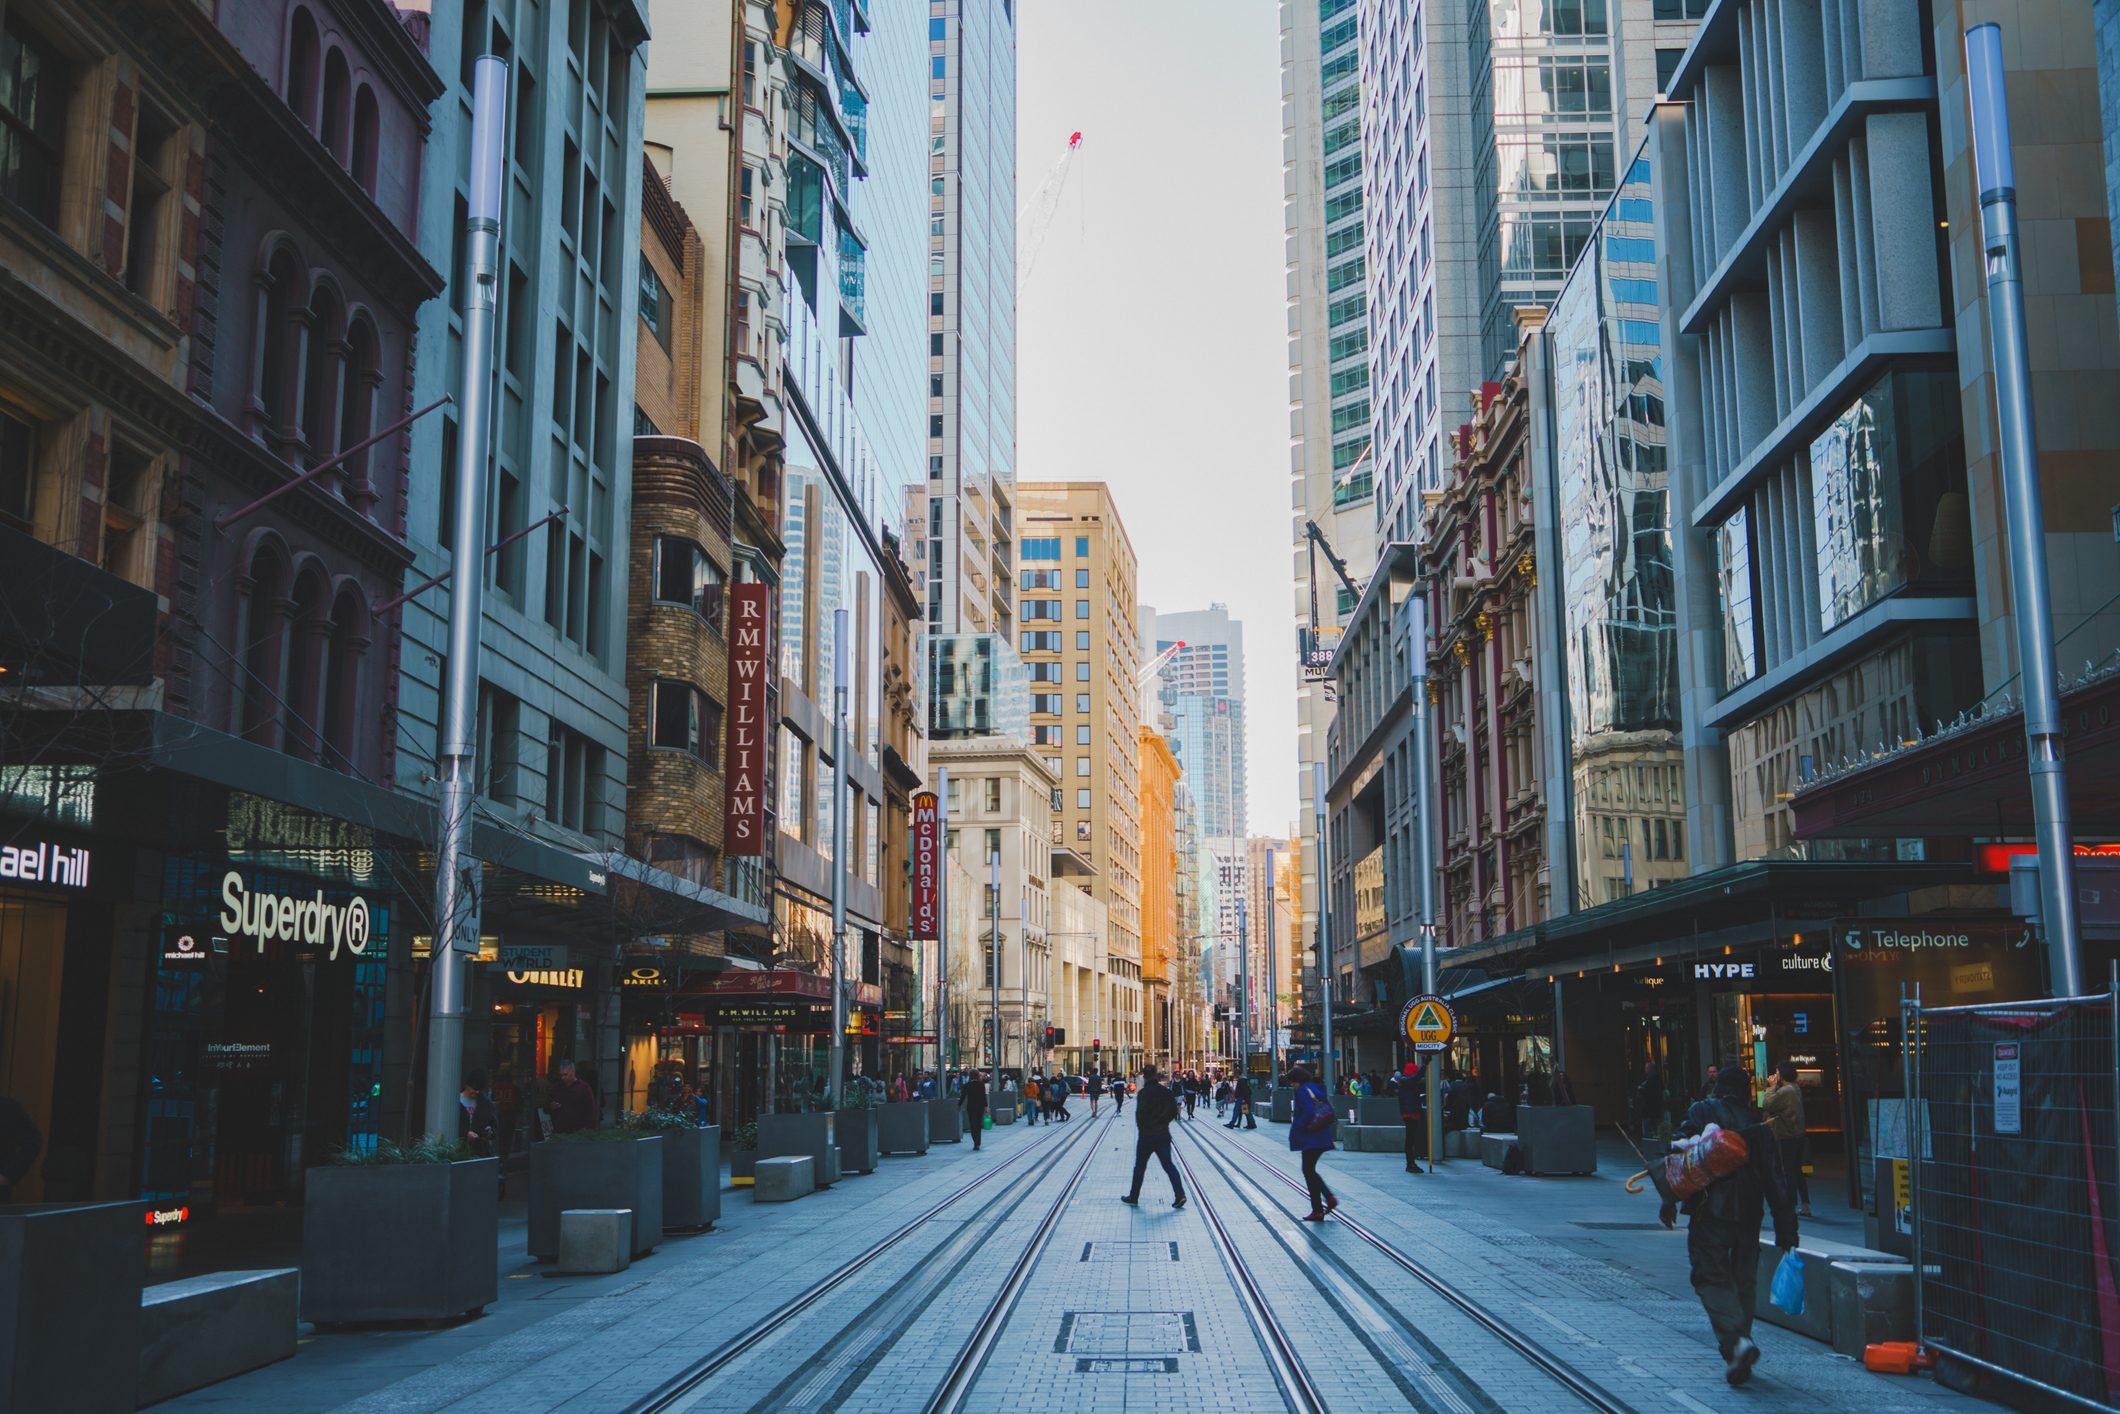 city street view